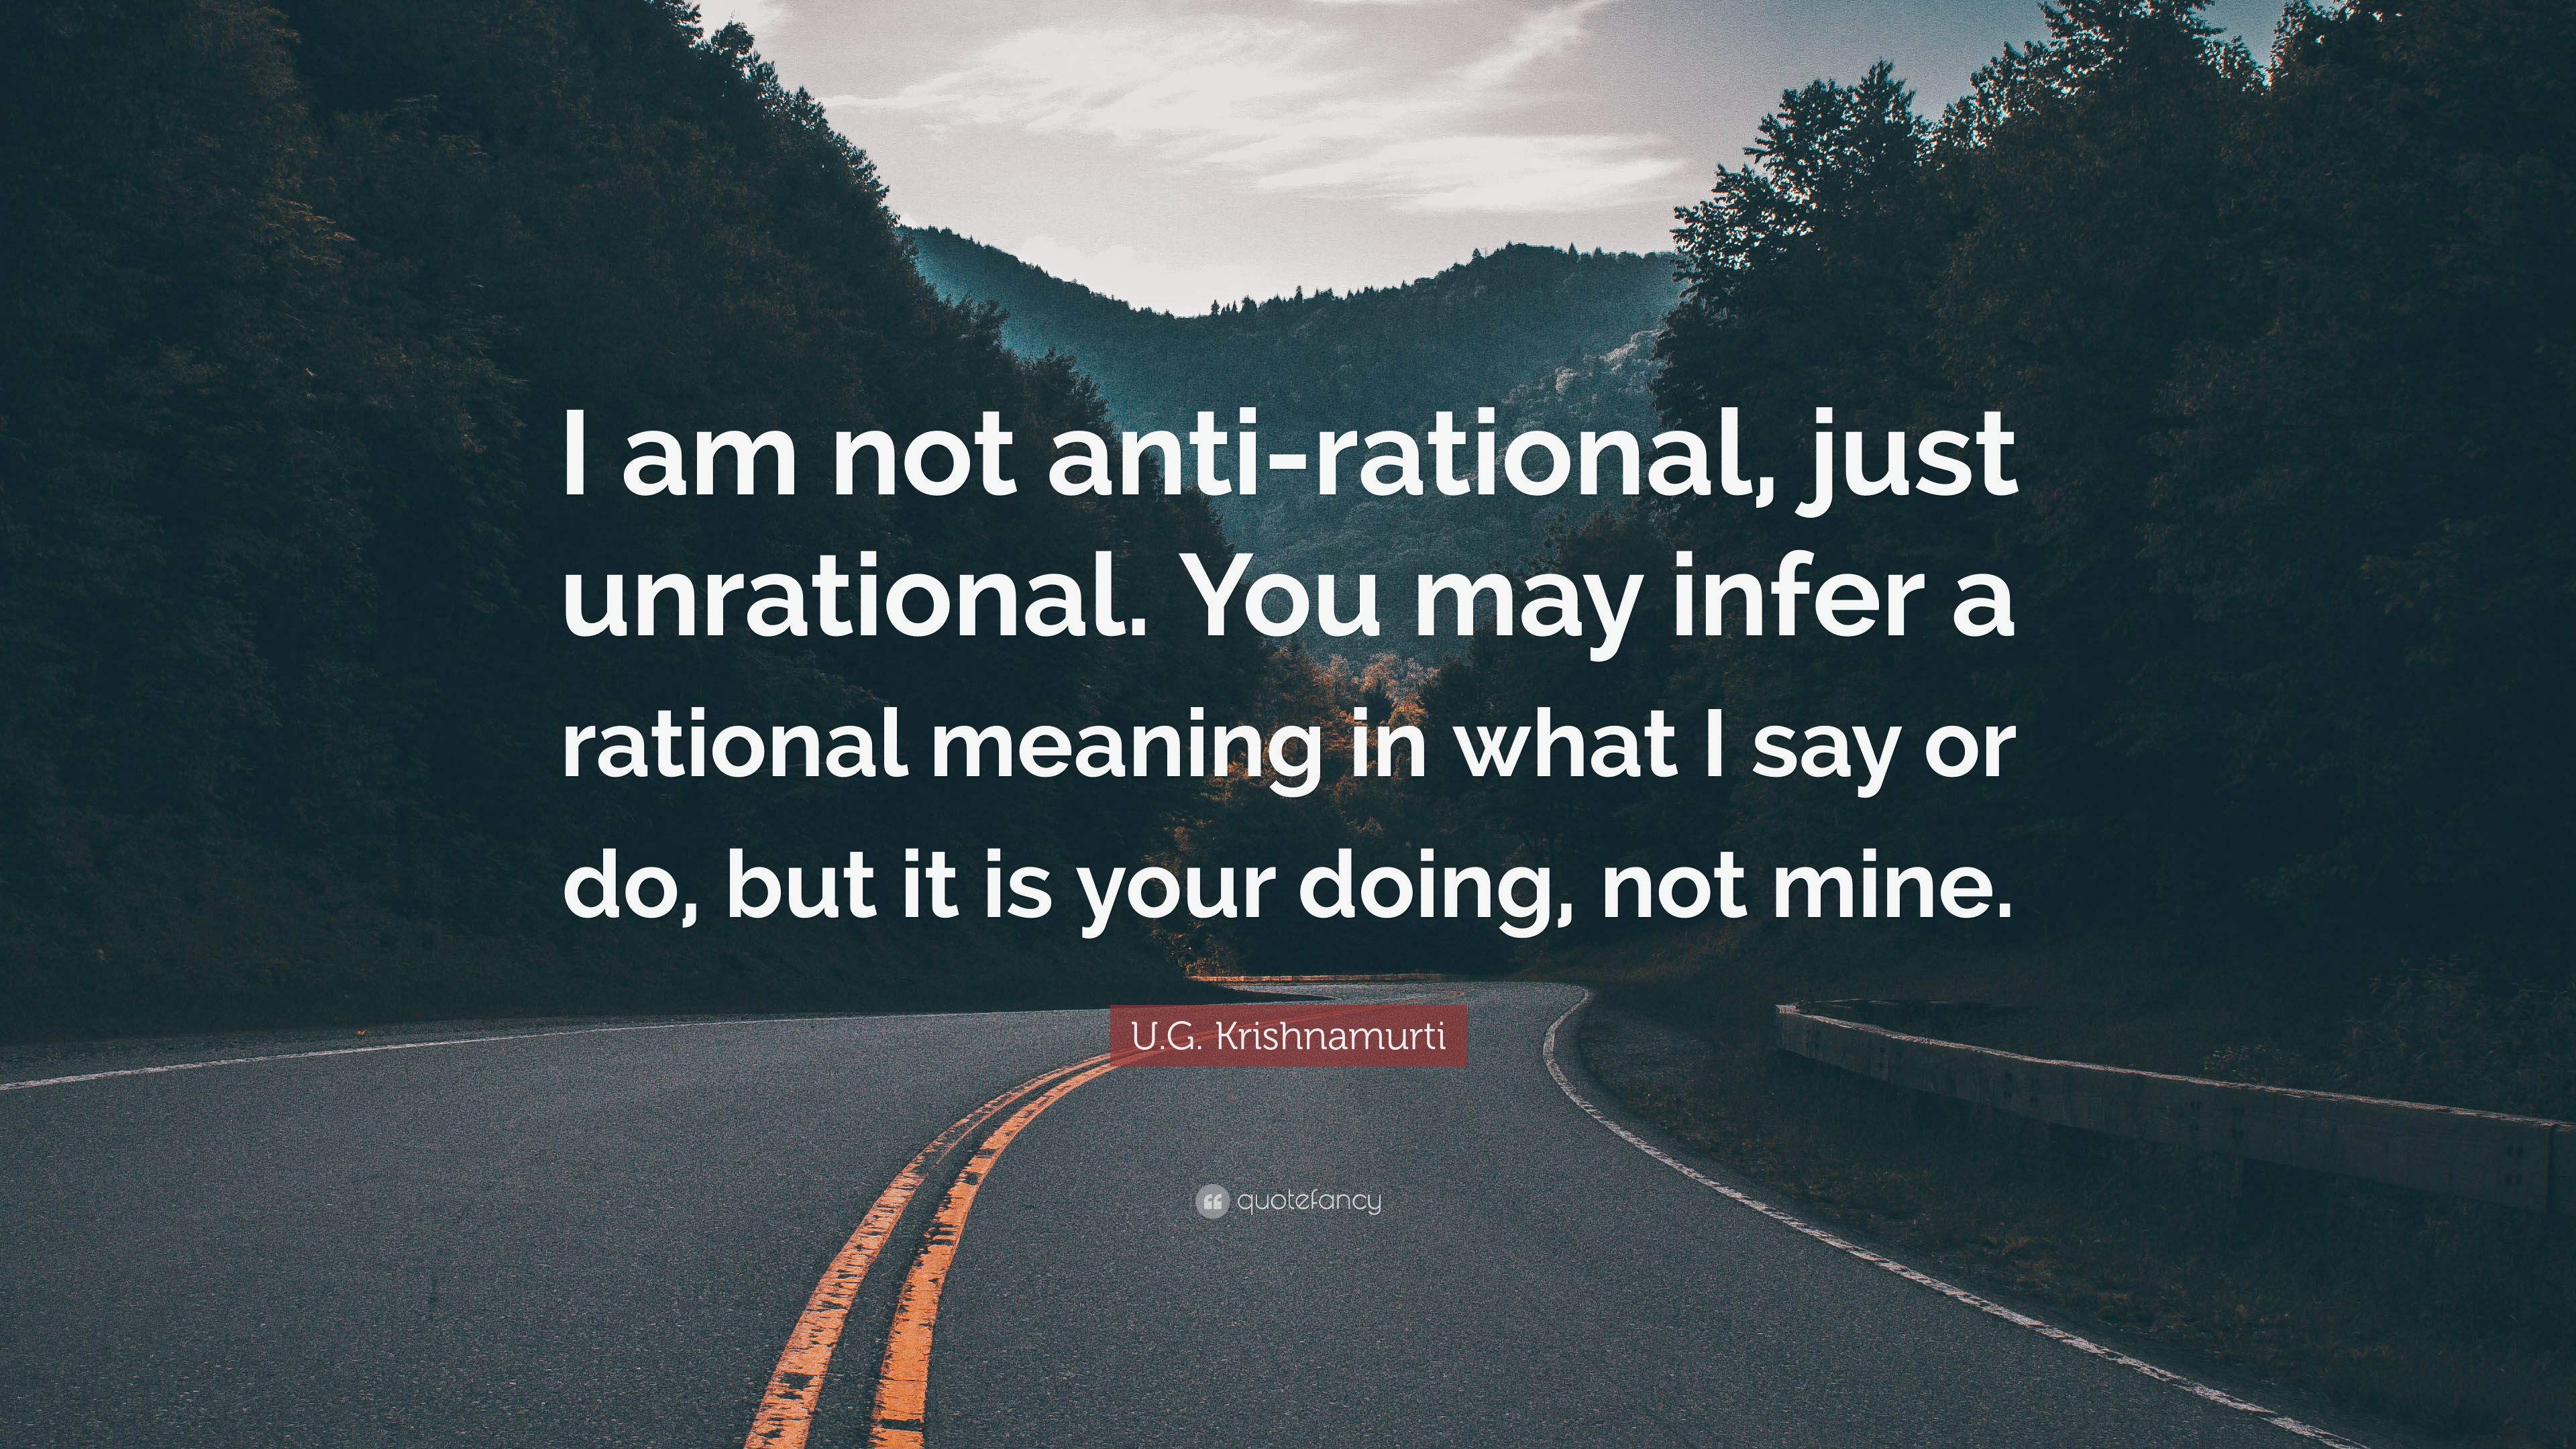 u g krishnamurti quote i am not anti rational just unrational